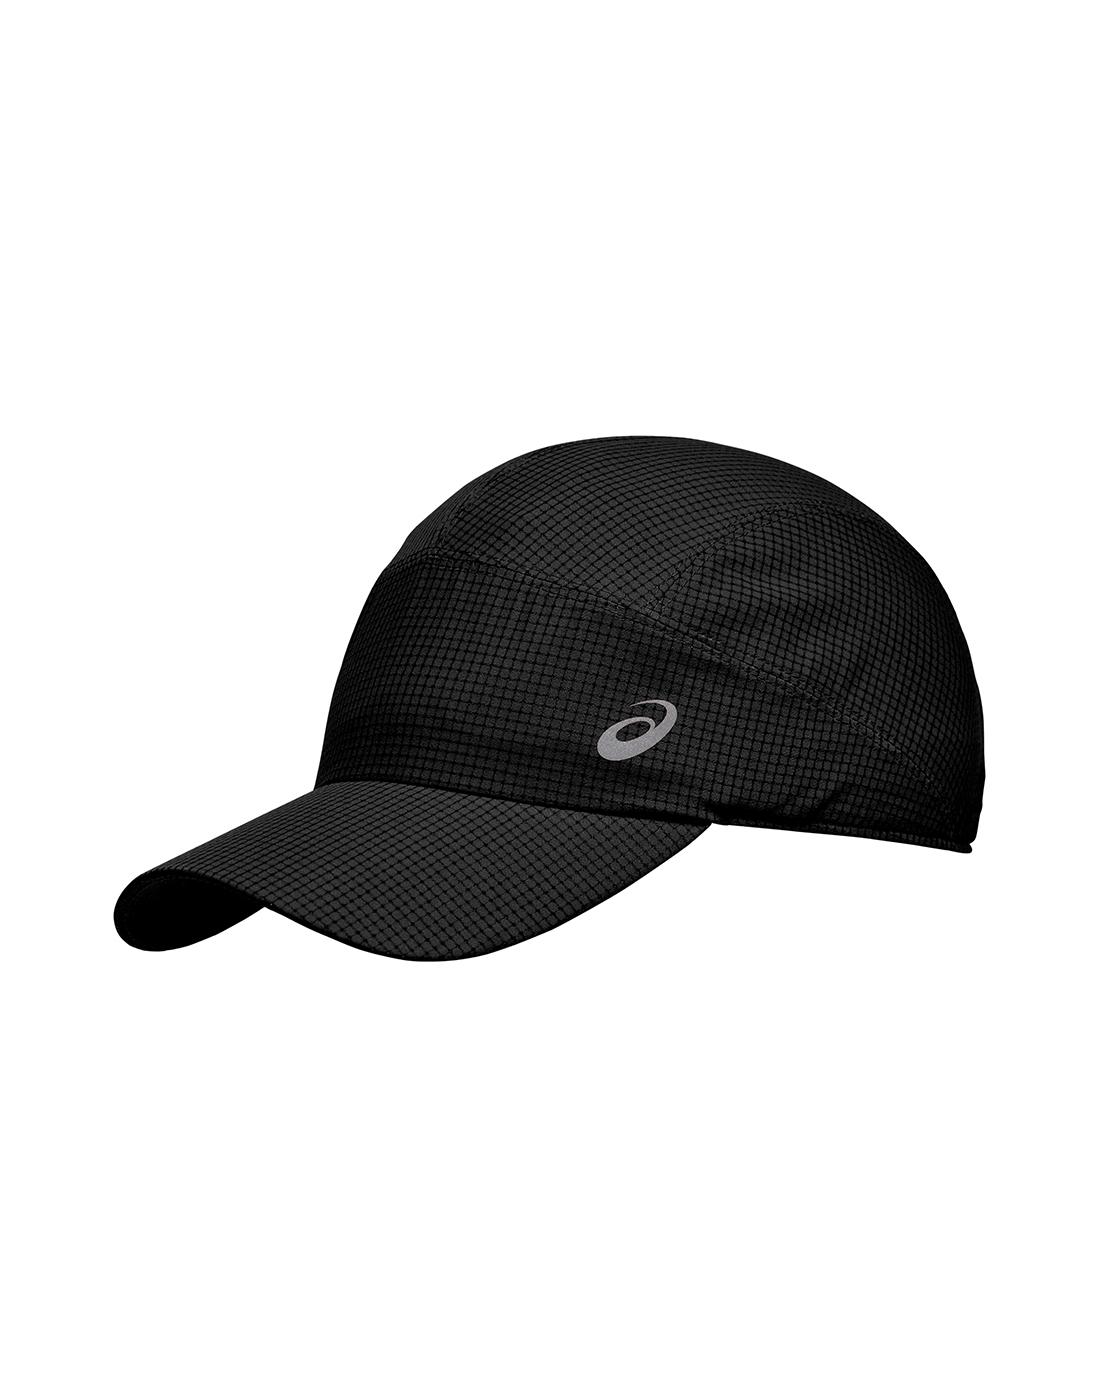 Asics Lightweight Running Cap - Black | Life Style Fitforhealth ...